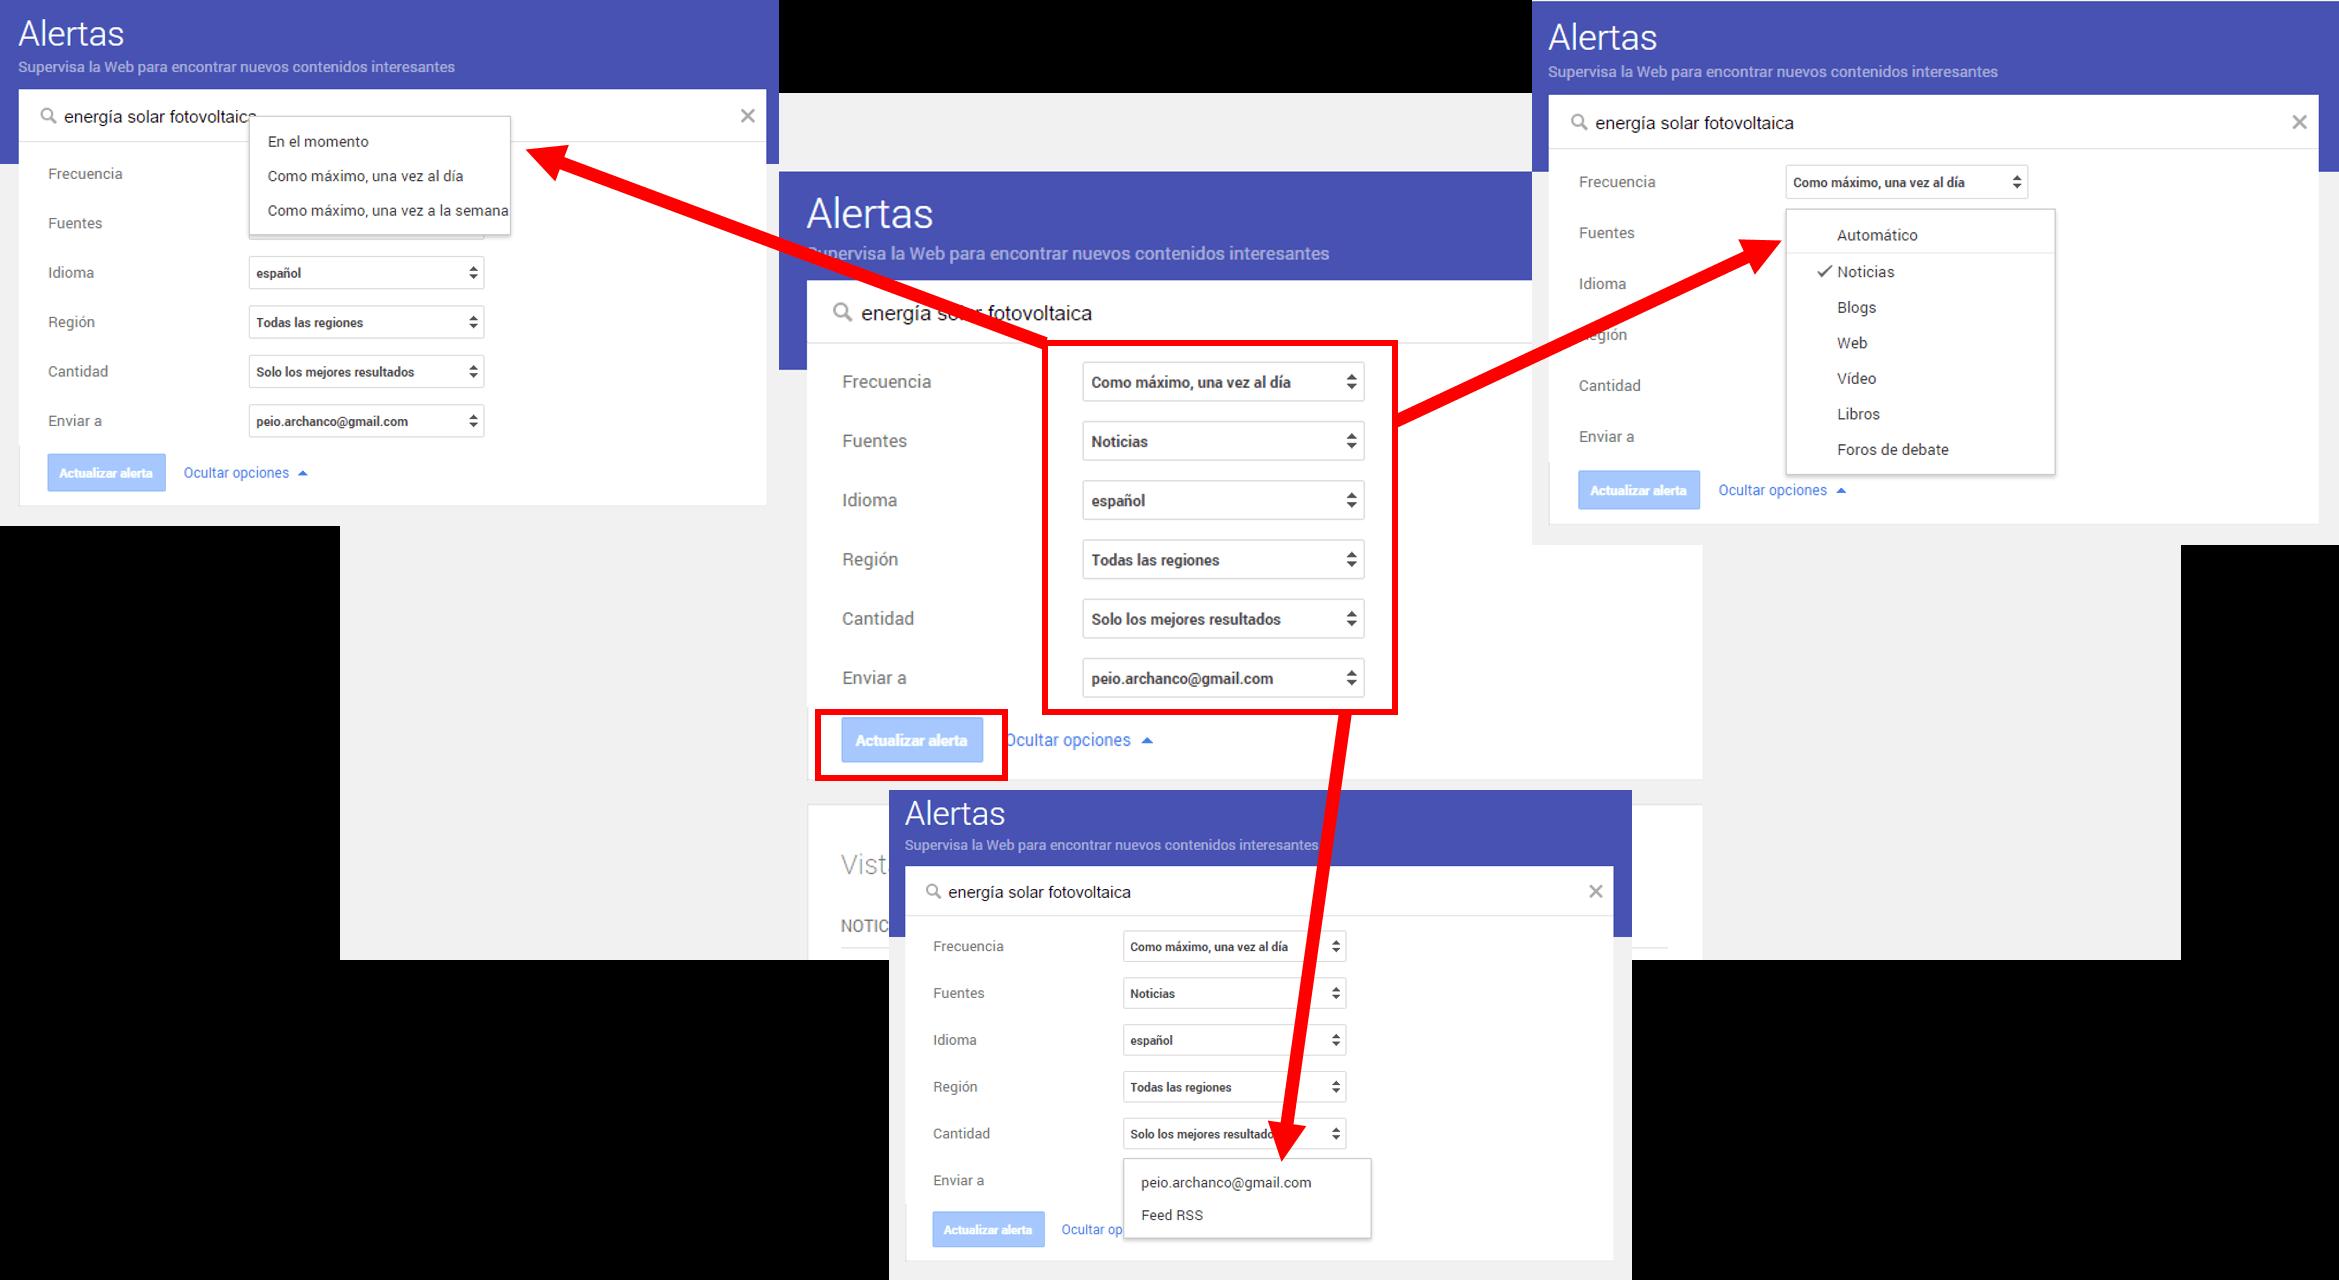 configurar-alerta-en-google-alerts